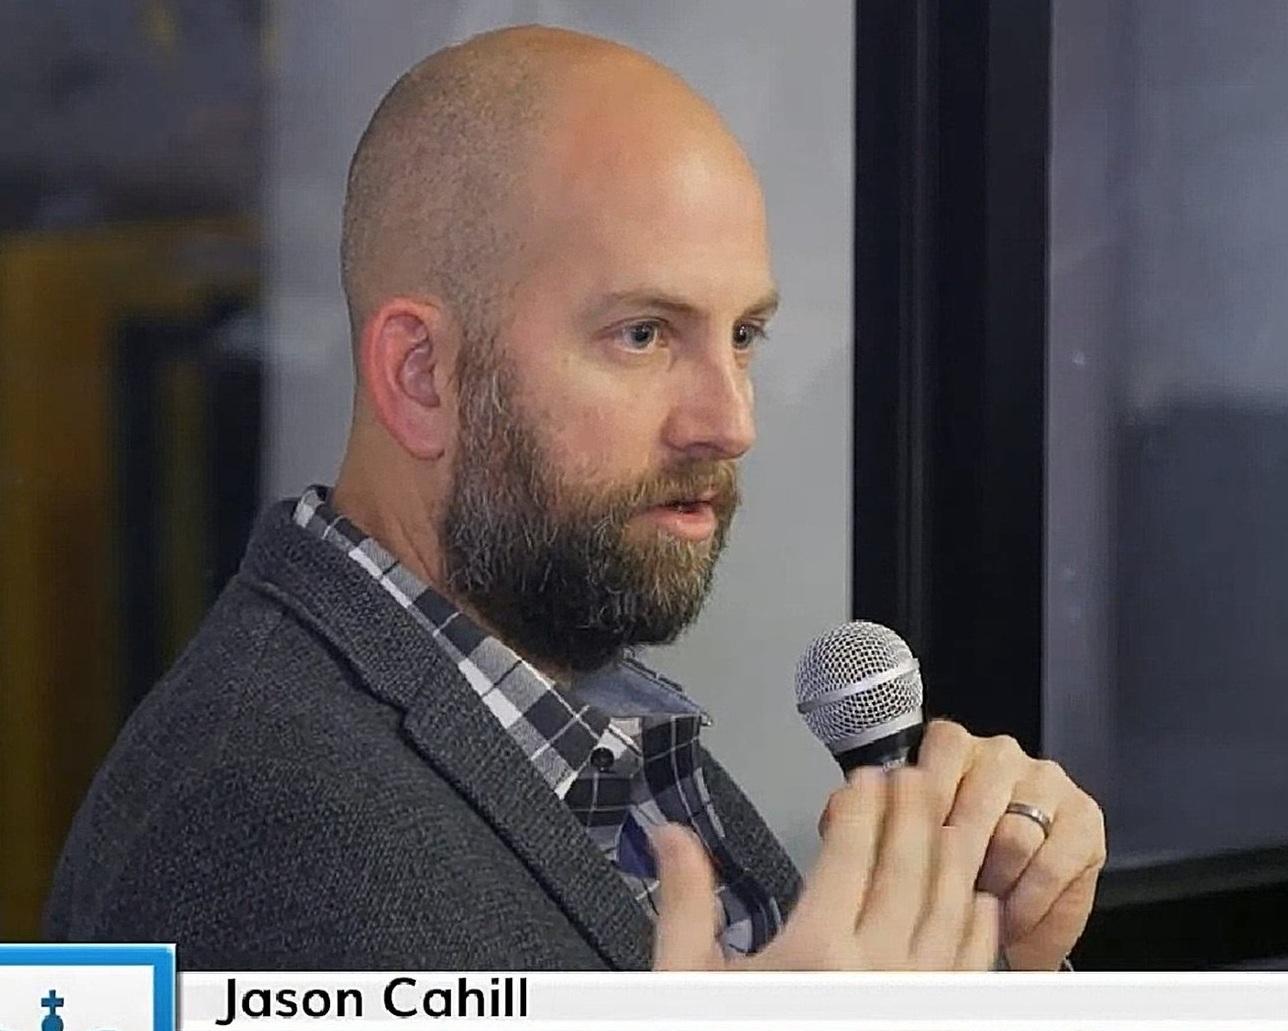 Jason Hacking For Defense panel 20190201.jpg